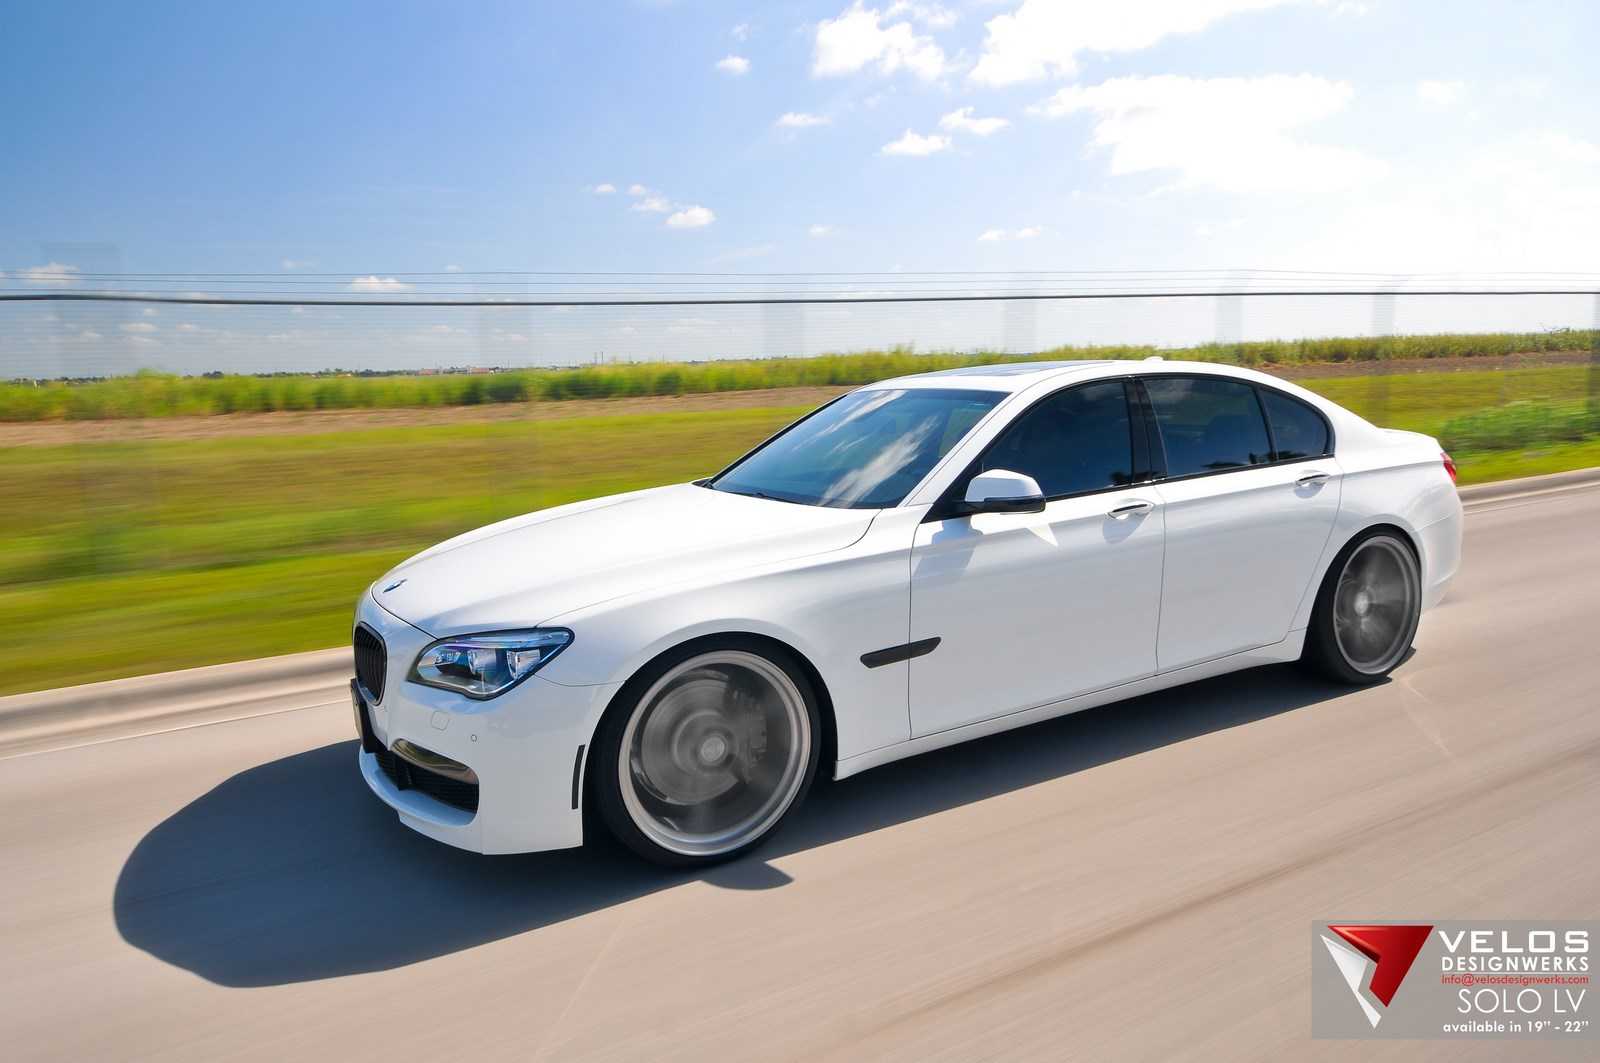 2013 BMW 750i Velos Designwerks 22 Solo LV Wheels 07